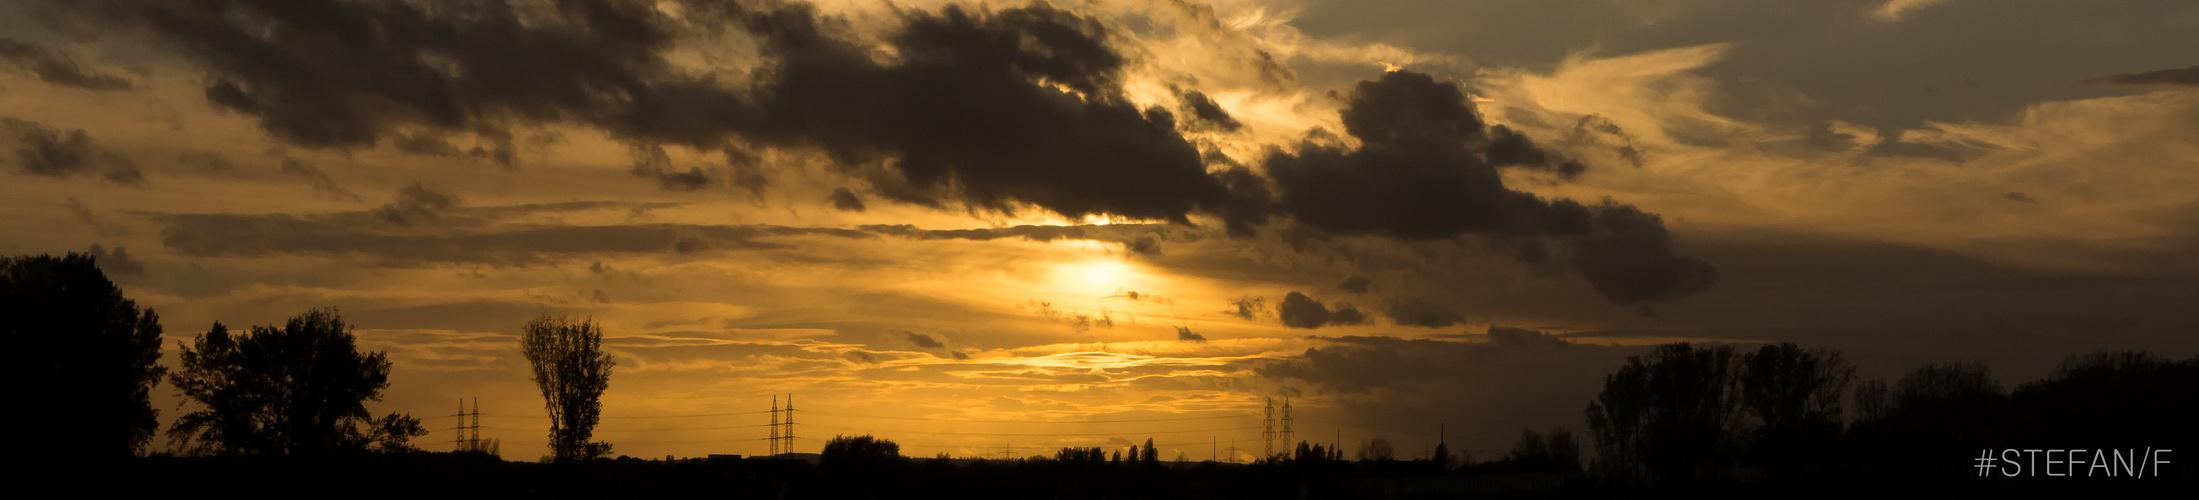 Abendsonne....